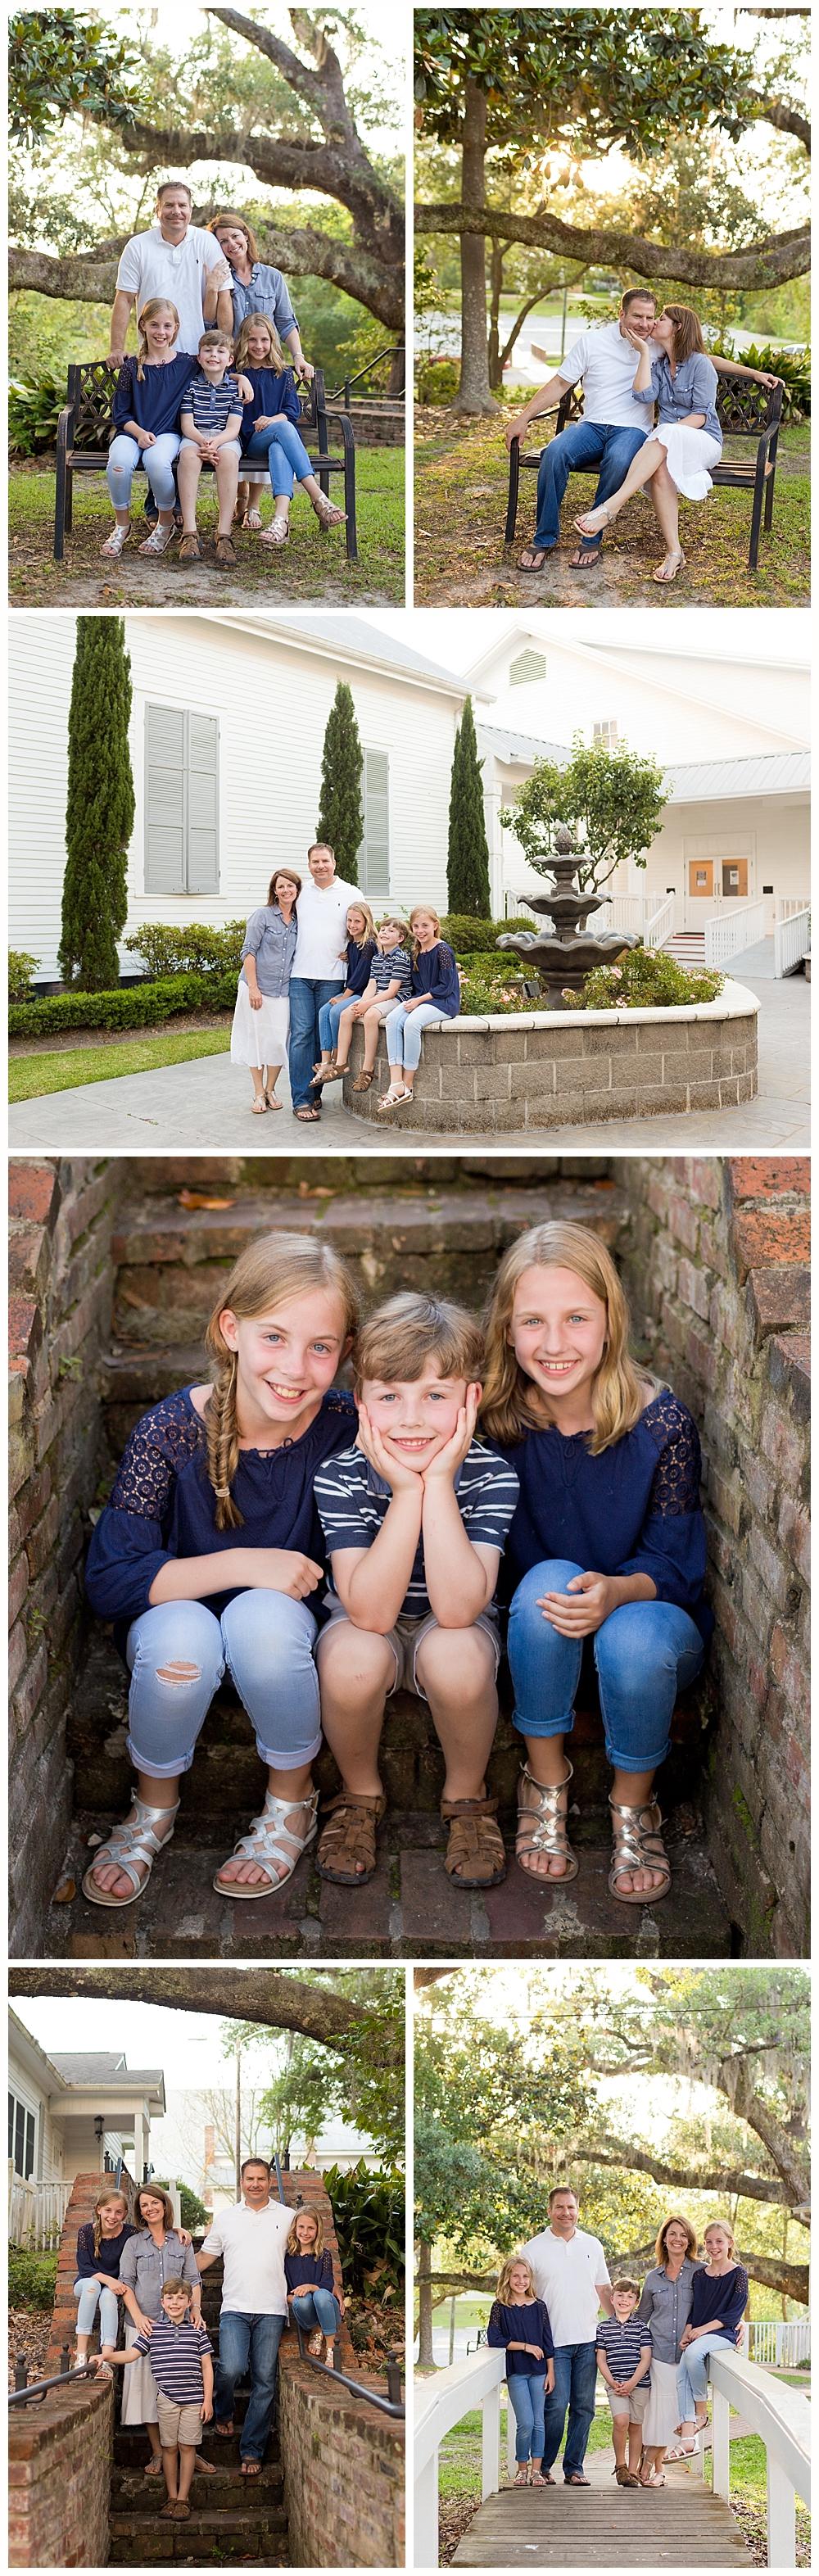 Ocean Springs family photographer - First Presbyterian Church